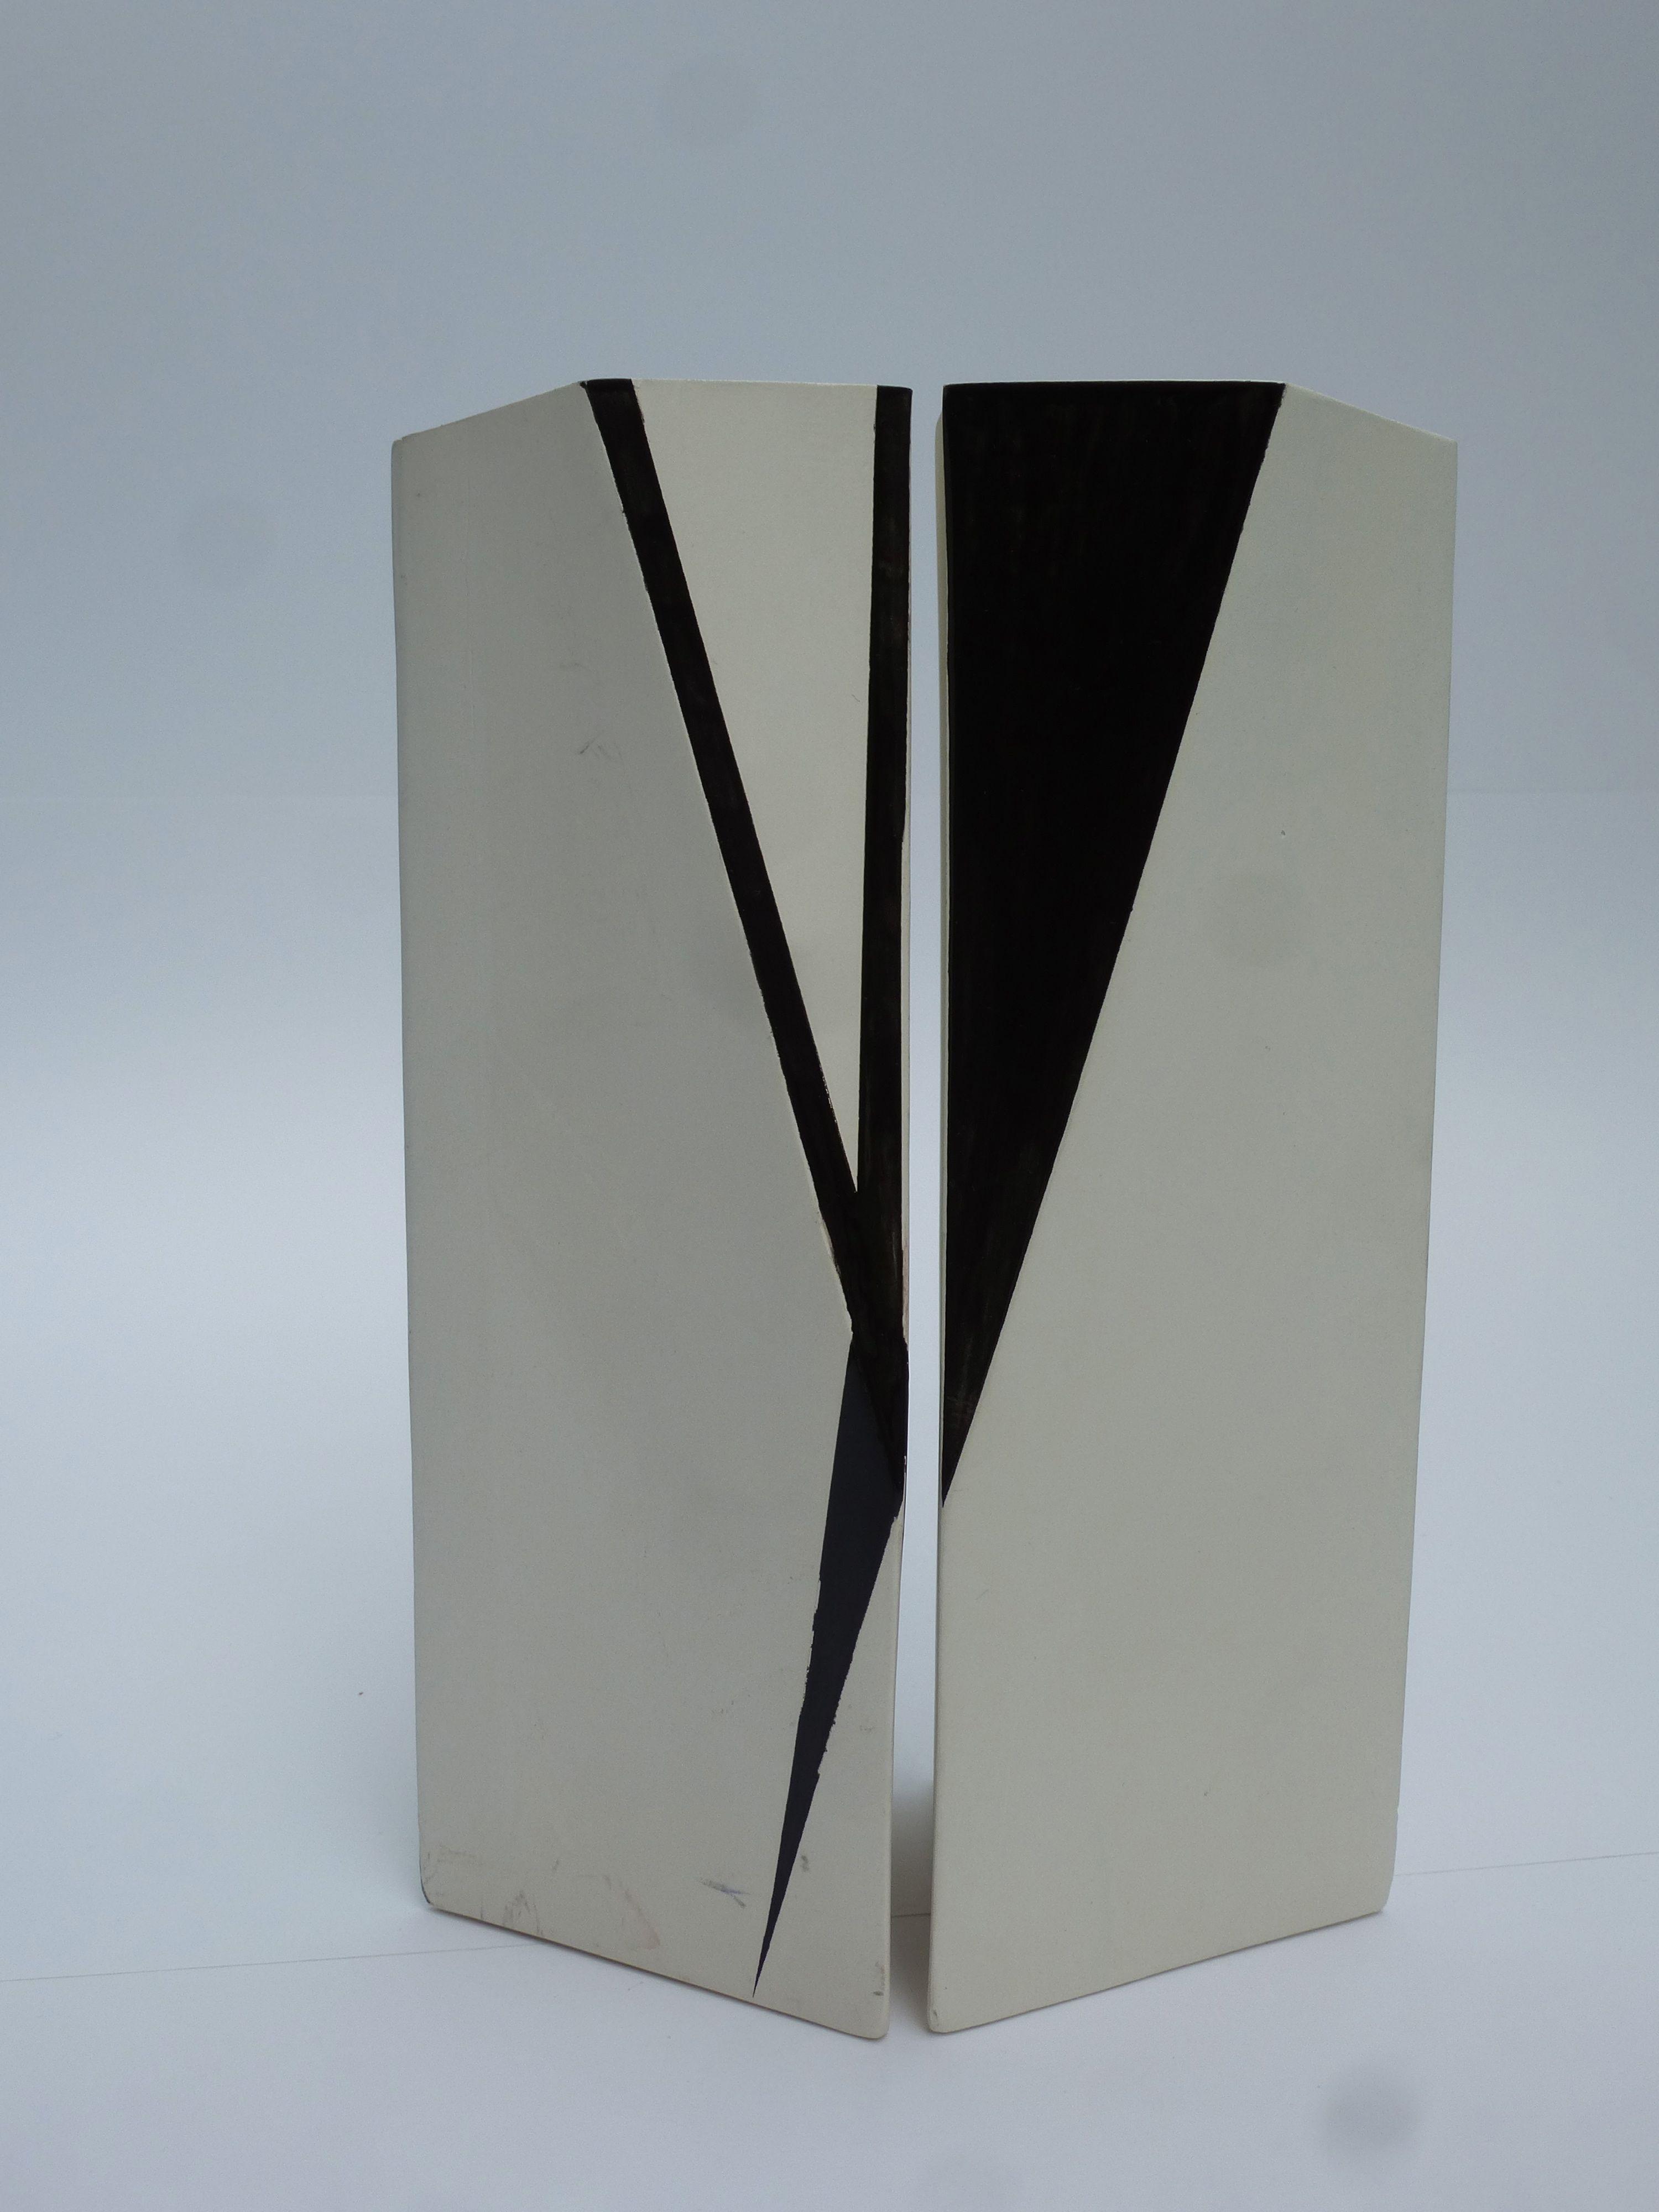 black glaze on unglazed white with blue or black glaze inside - Version 2